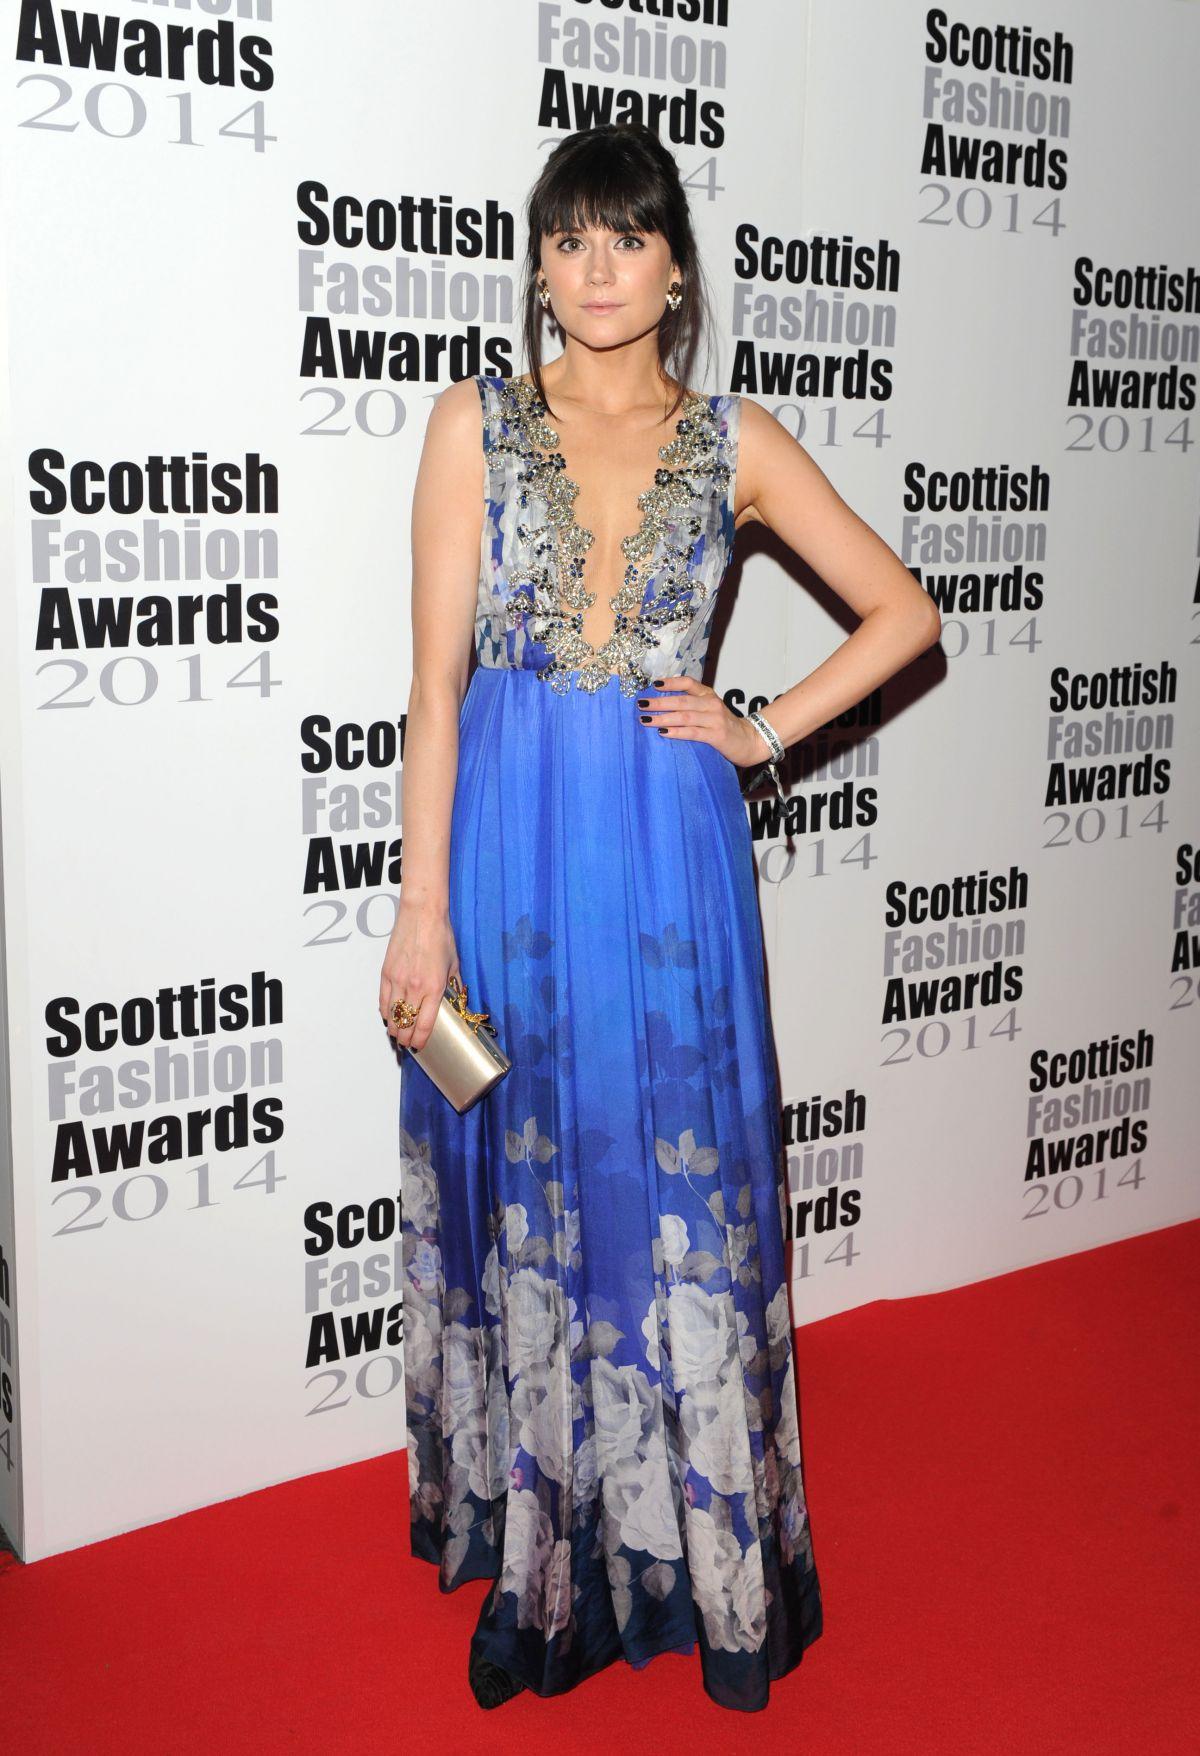 LILAH PARSONS at Scottish Fashion Awards 2014 in London